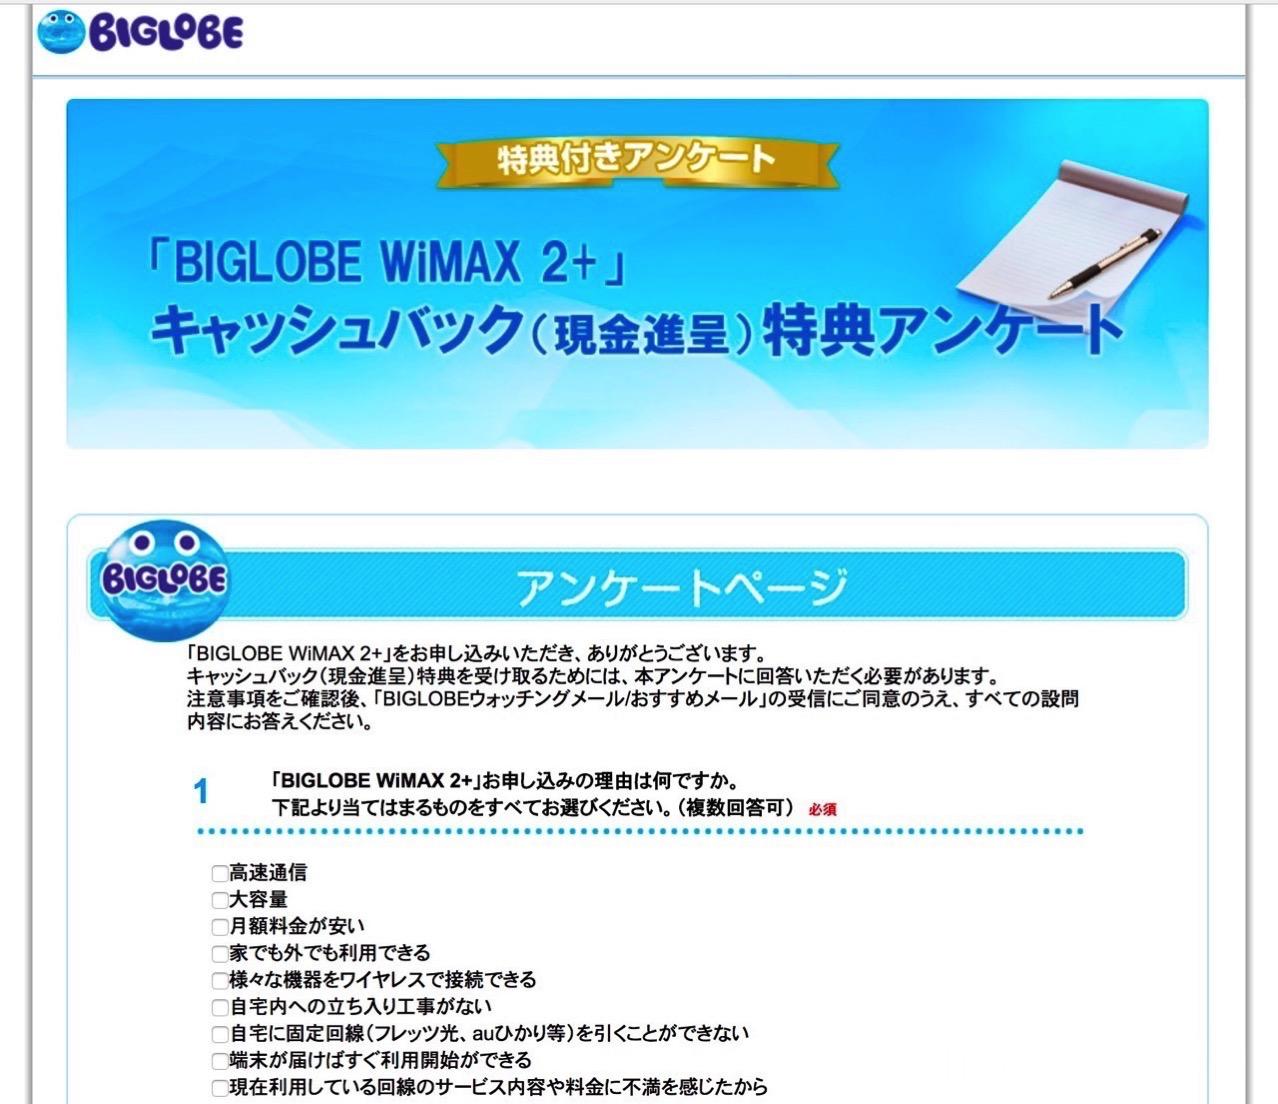 170410 biglobe wimax 9